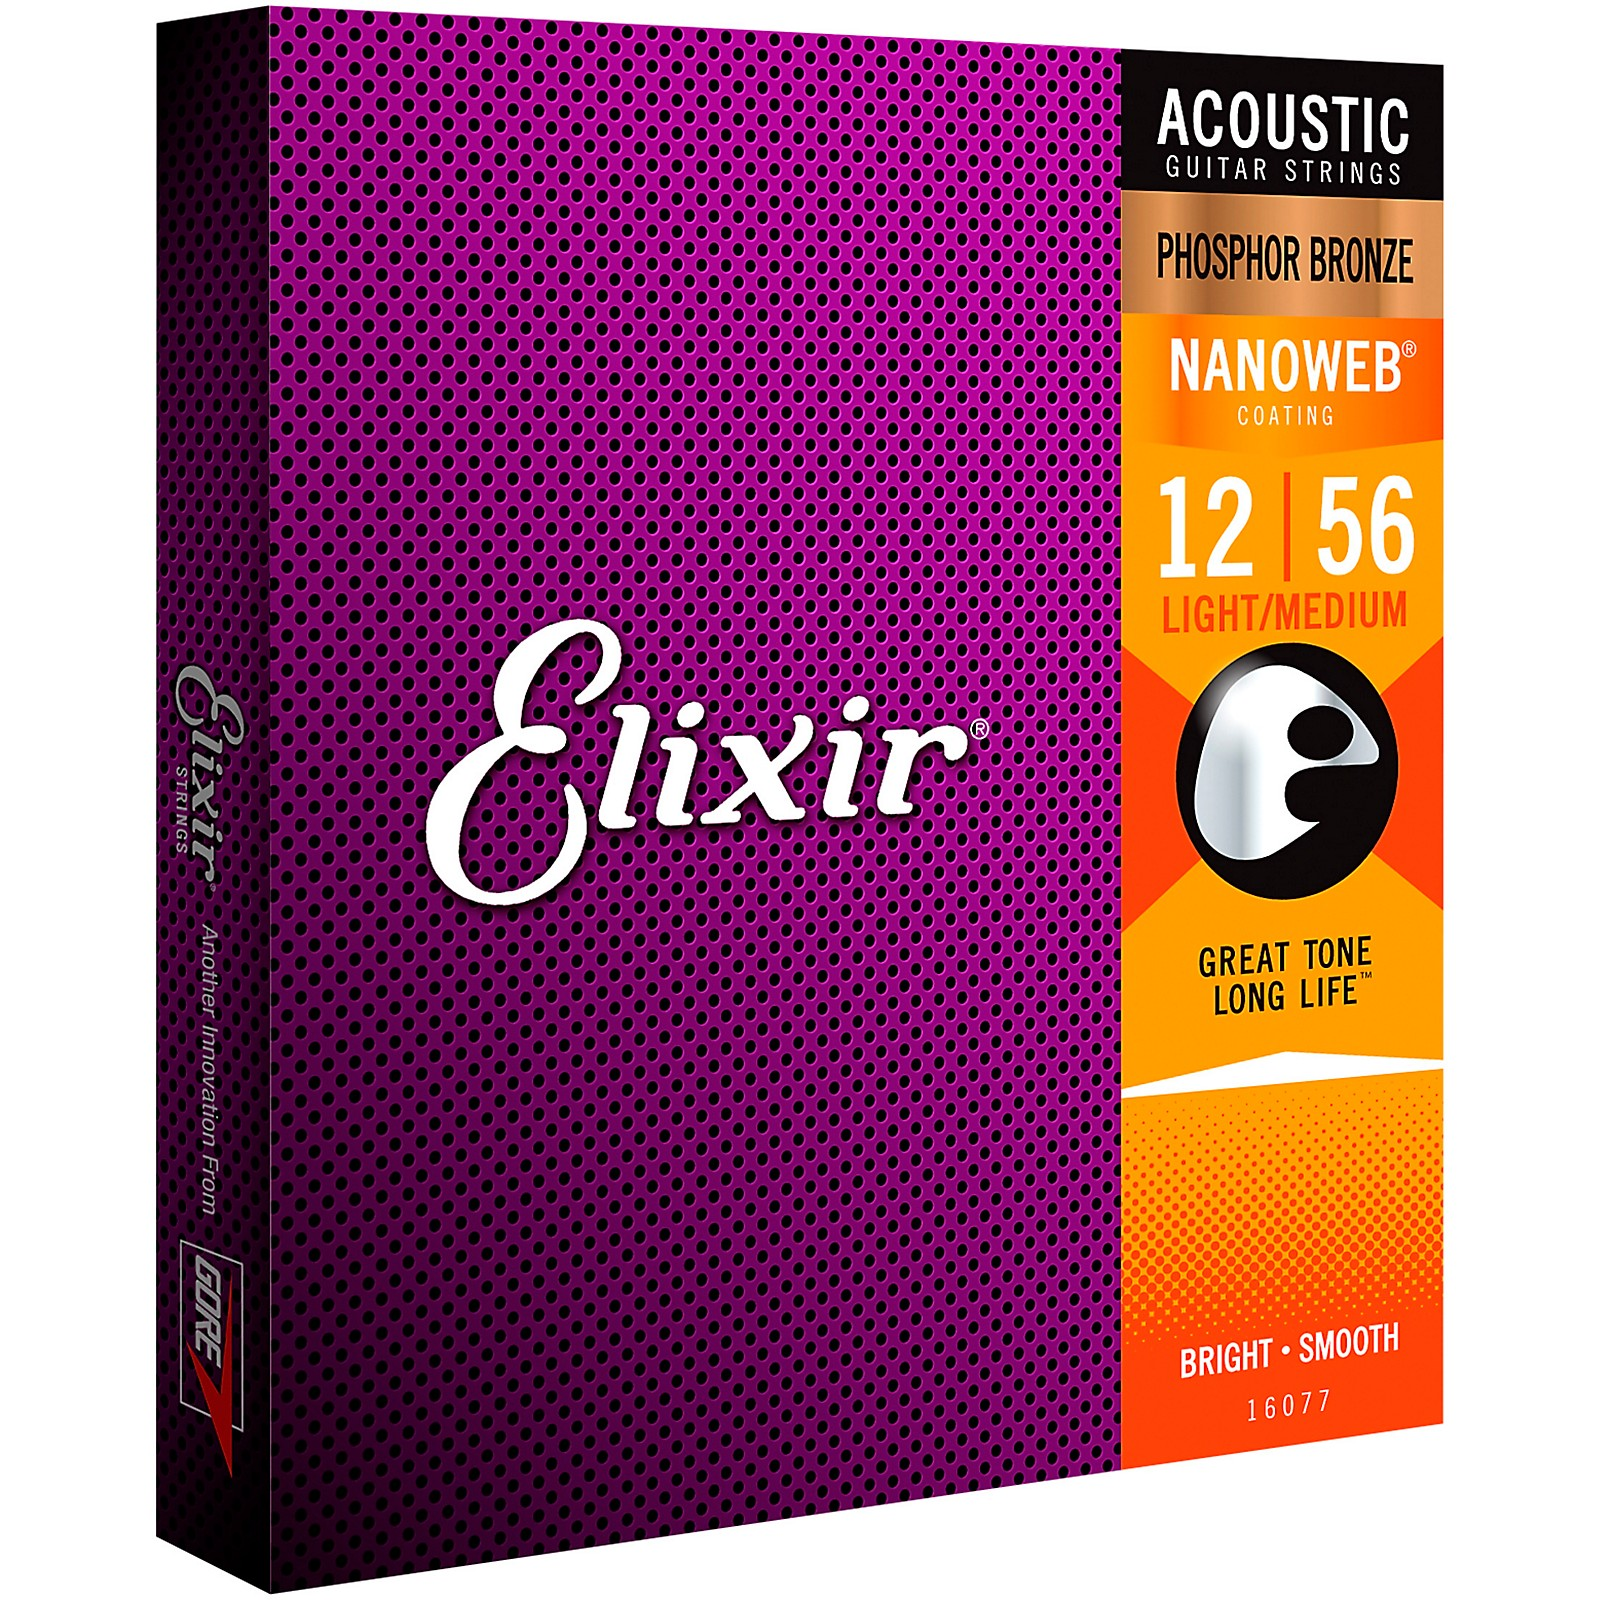 Elixir Phosphor Bronze Acoustic Guitar Strings with NANOWEB Coating, Light/Medium (.012-.056)